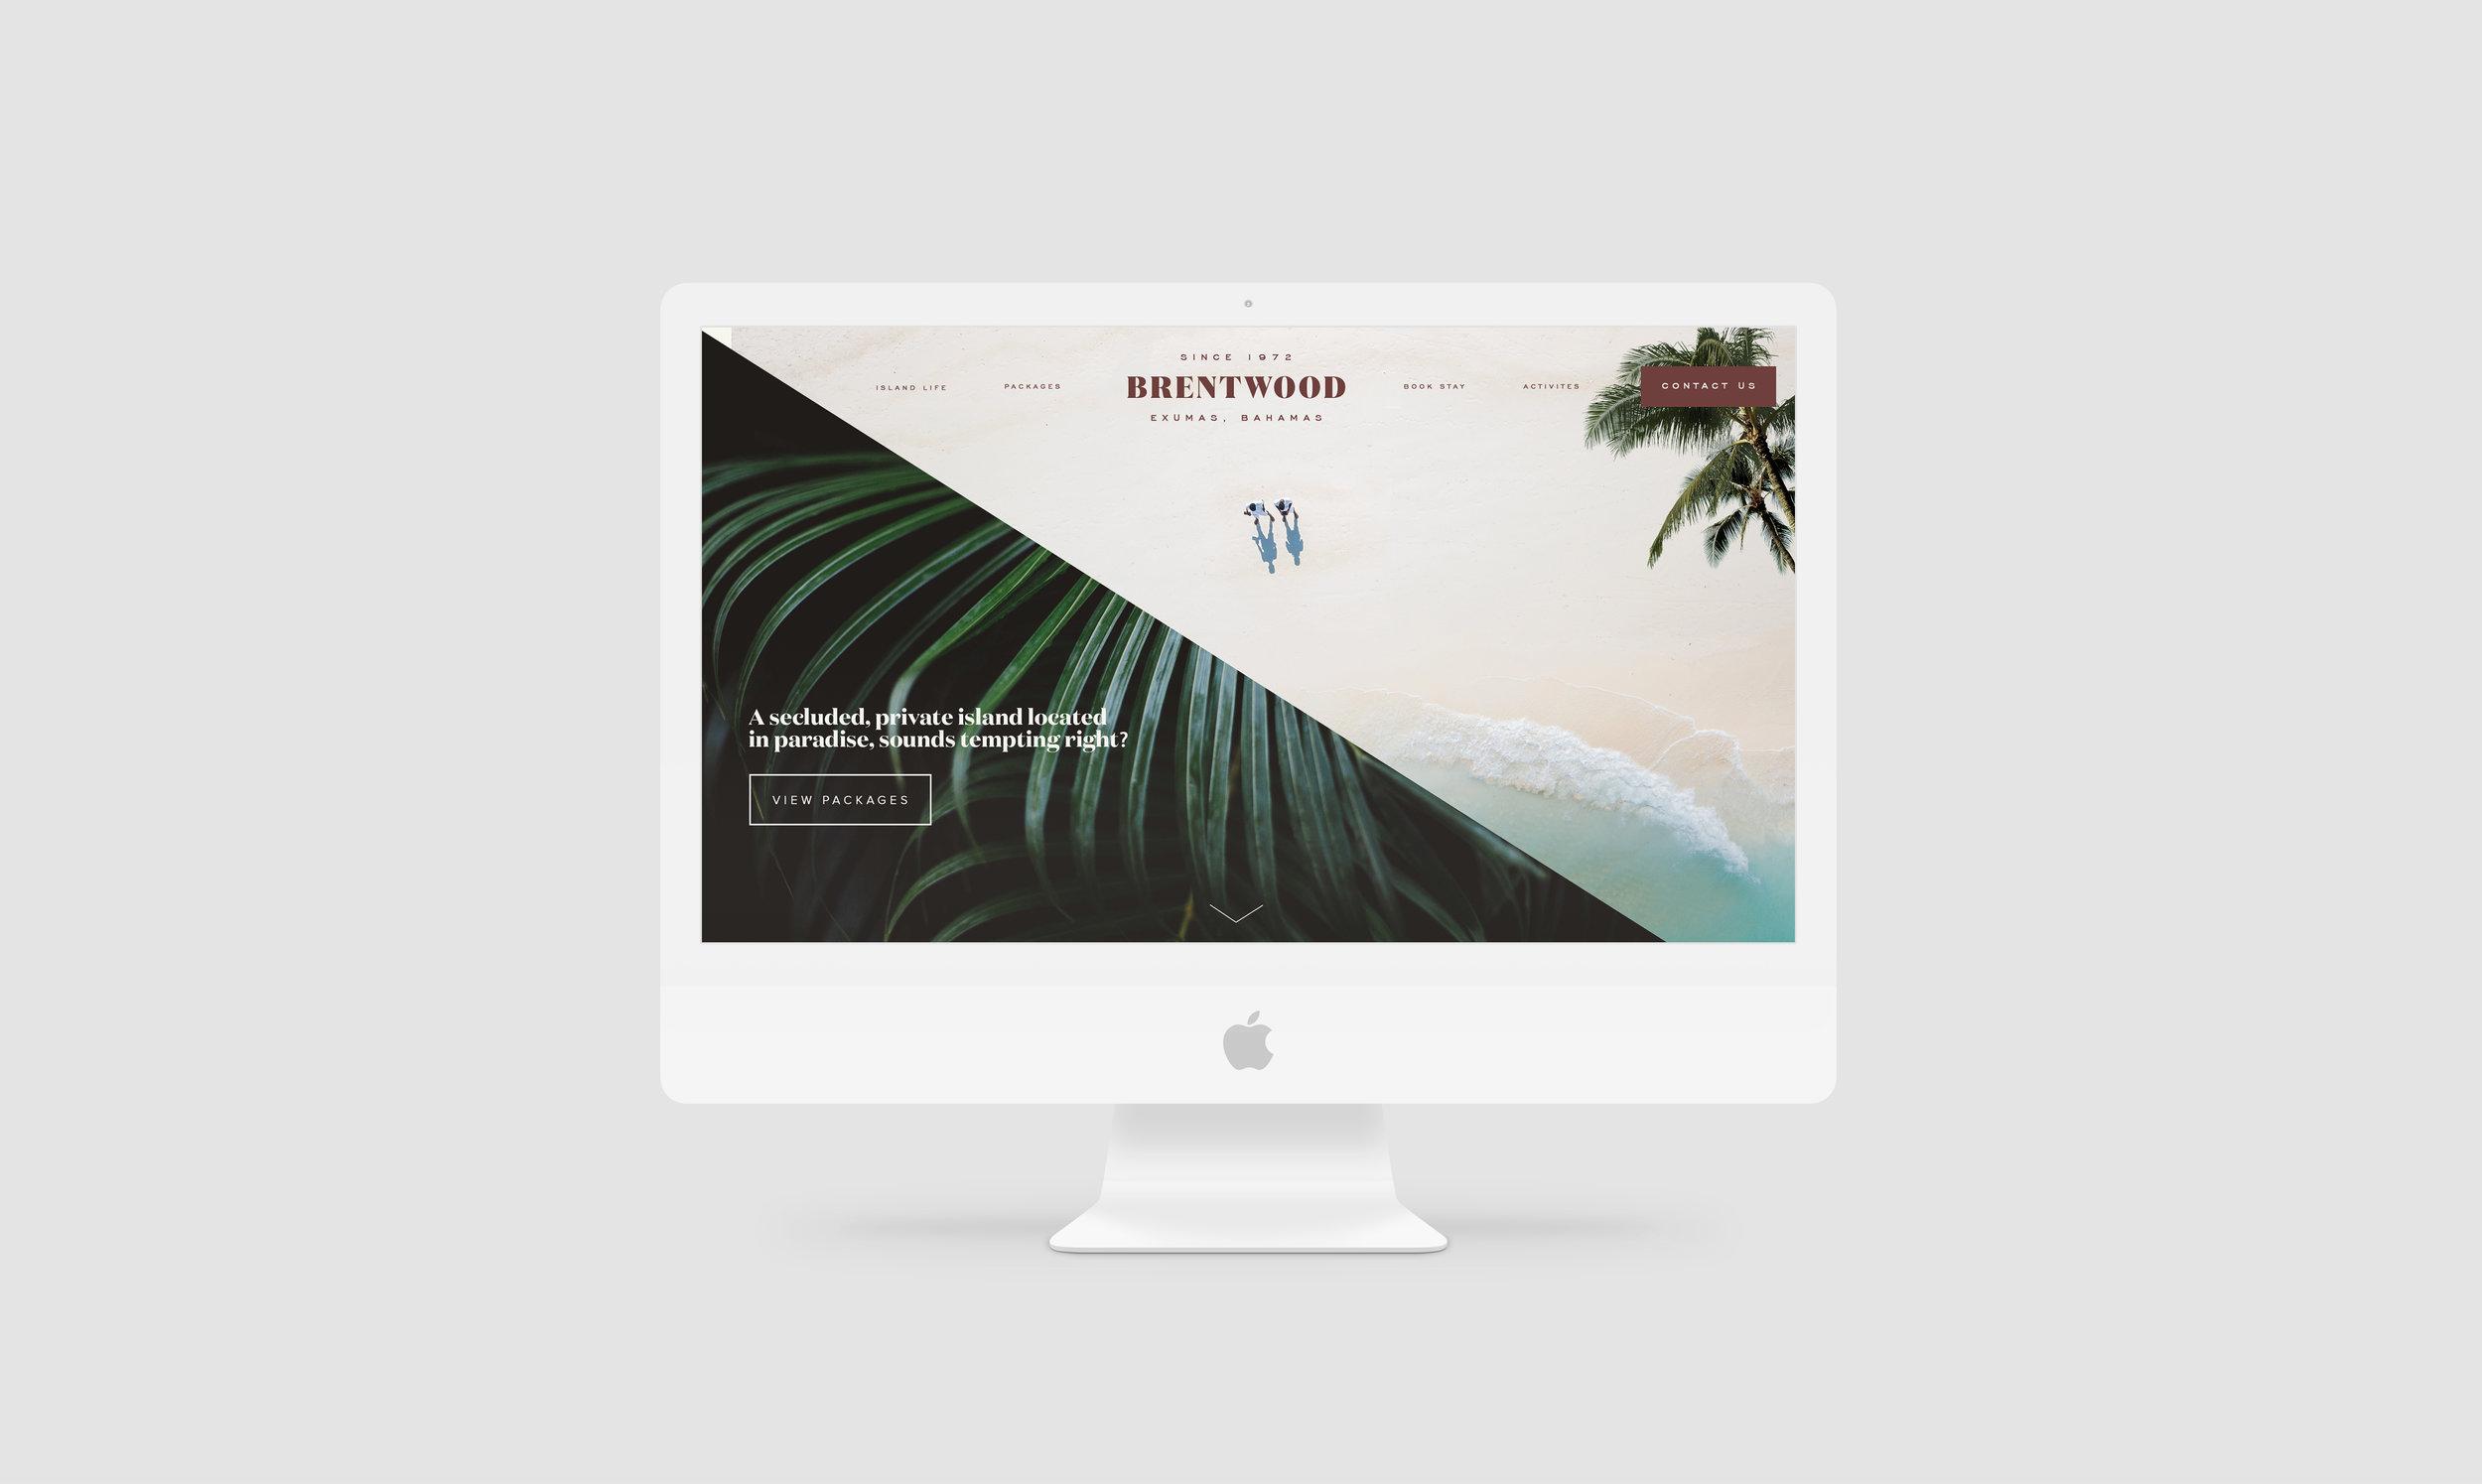 brentwood desktop.jpg